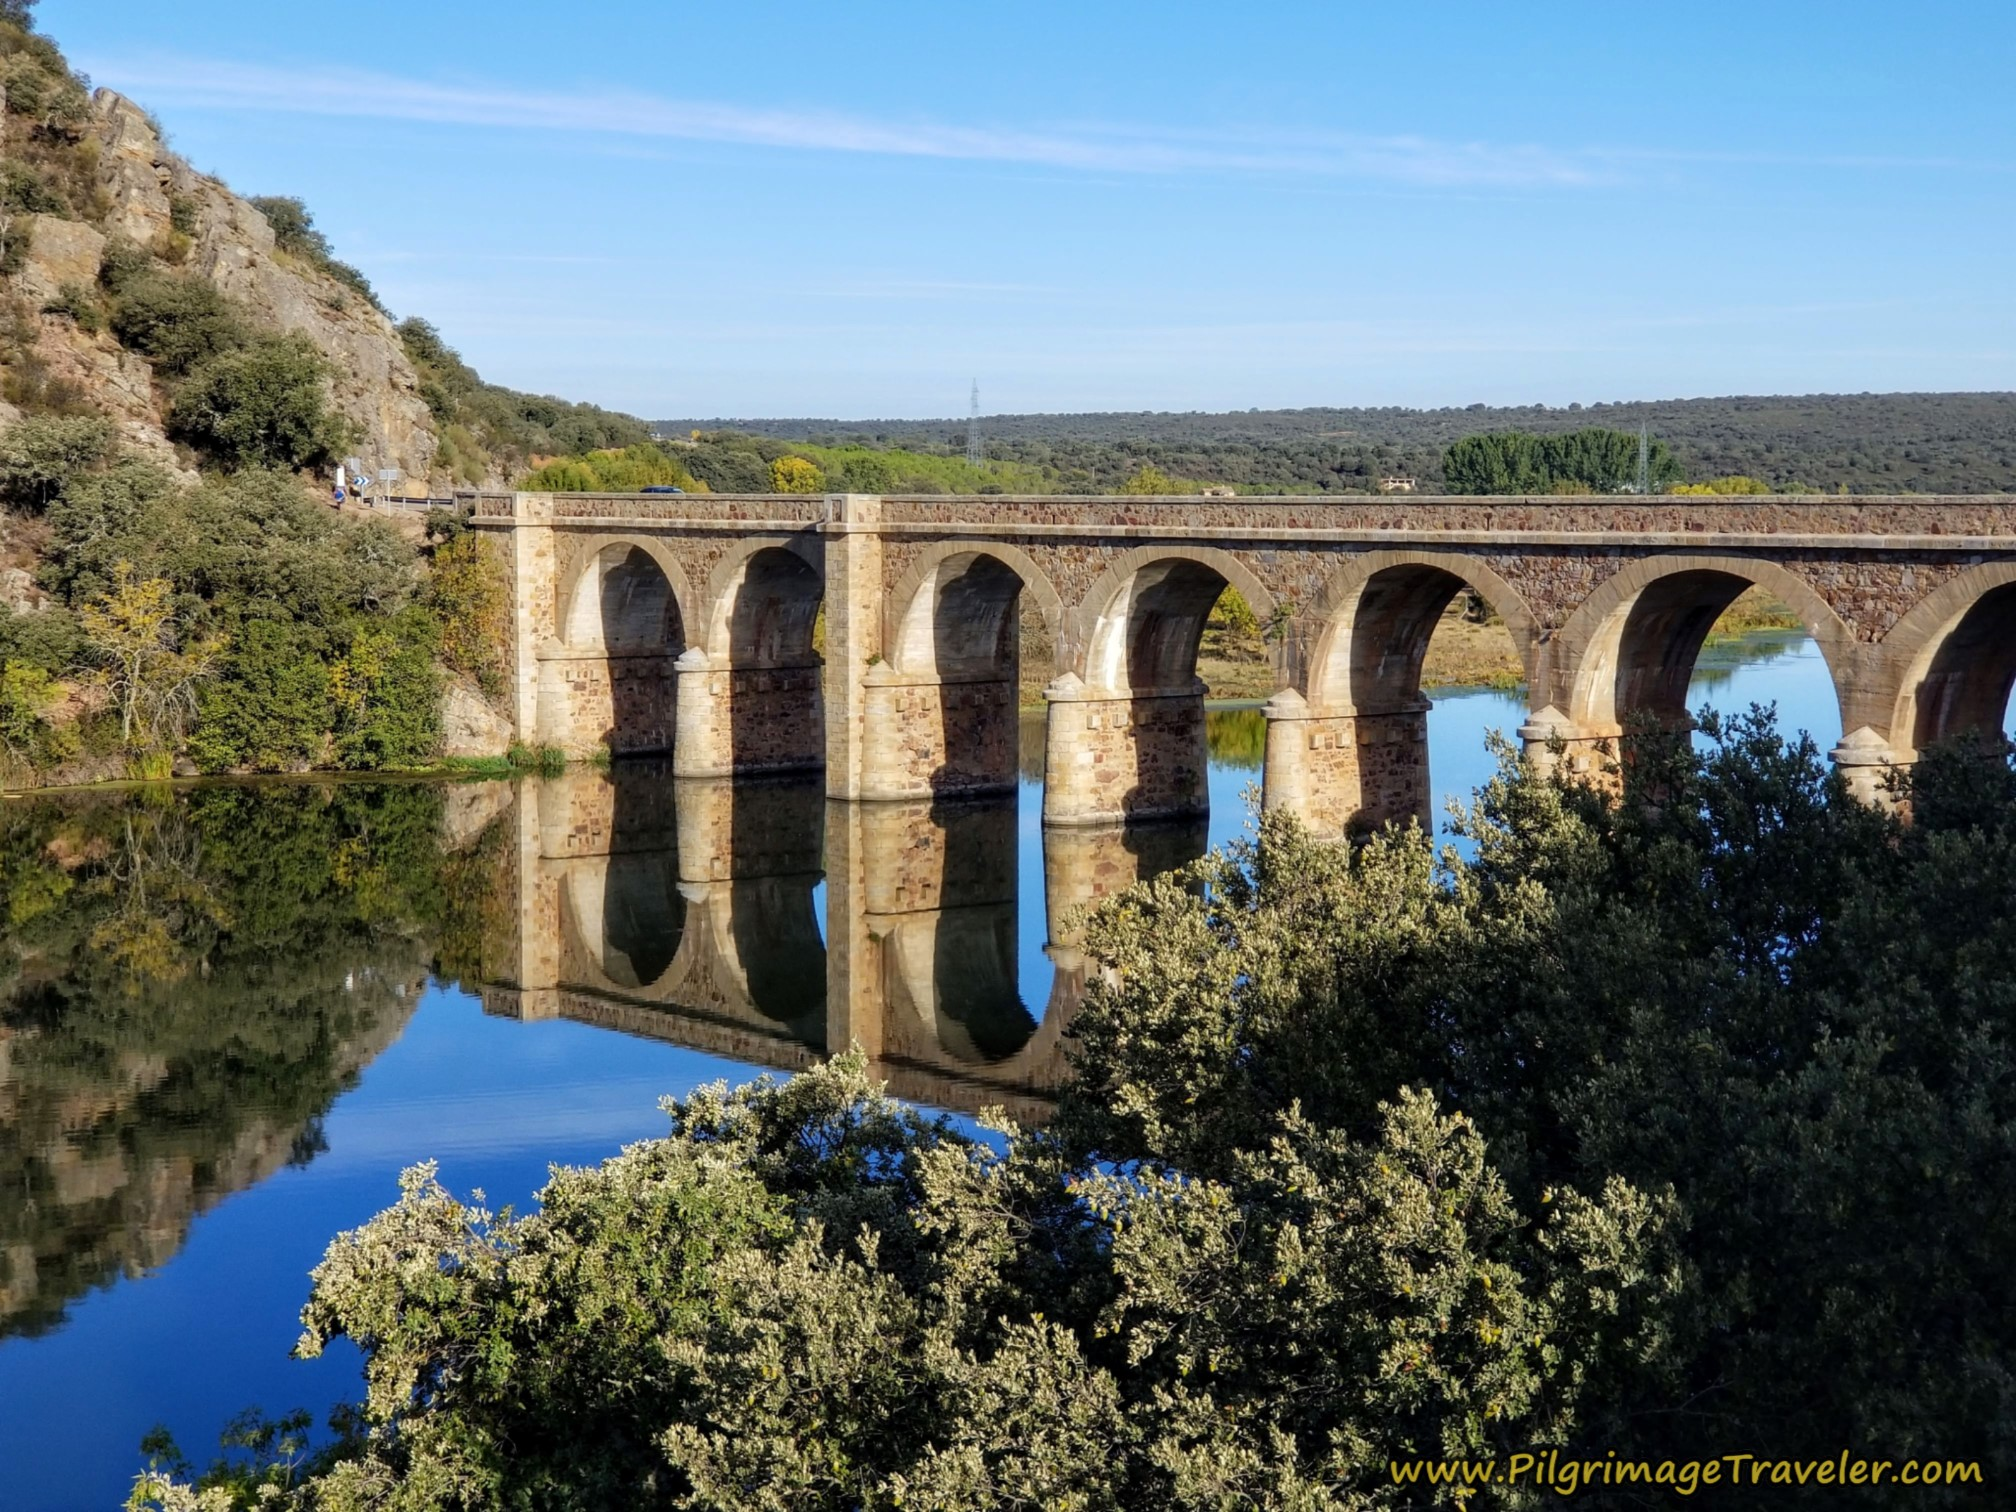 Cross the Río Esla on this Bridge